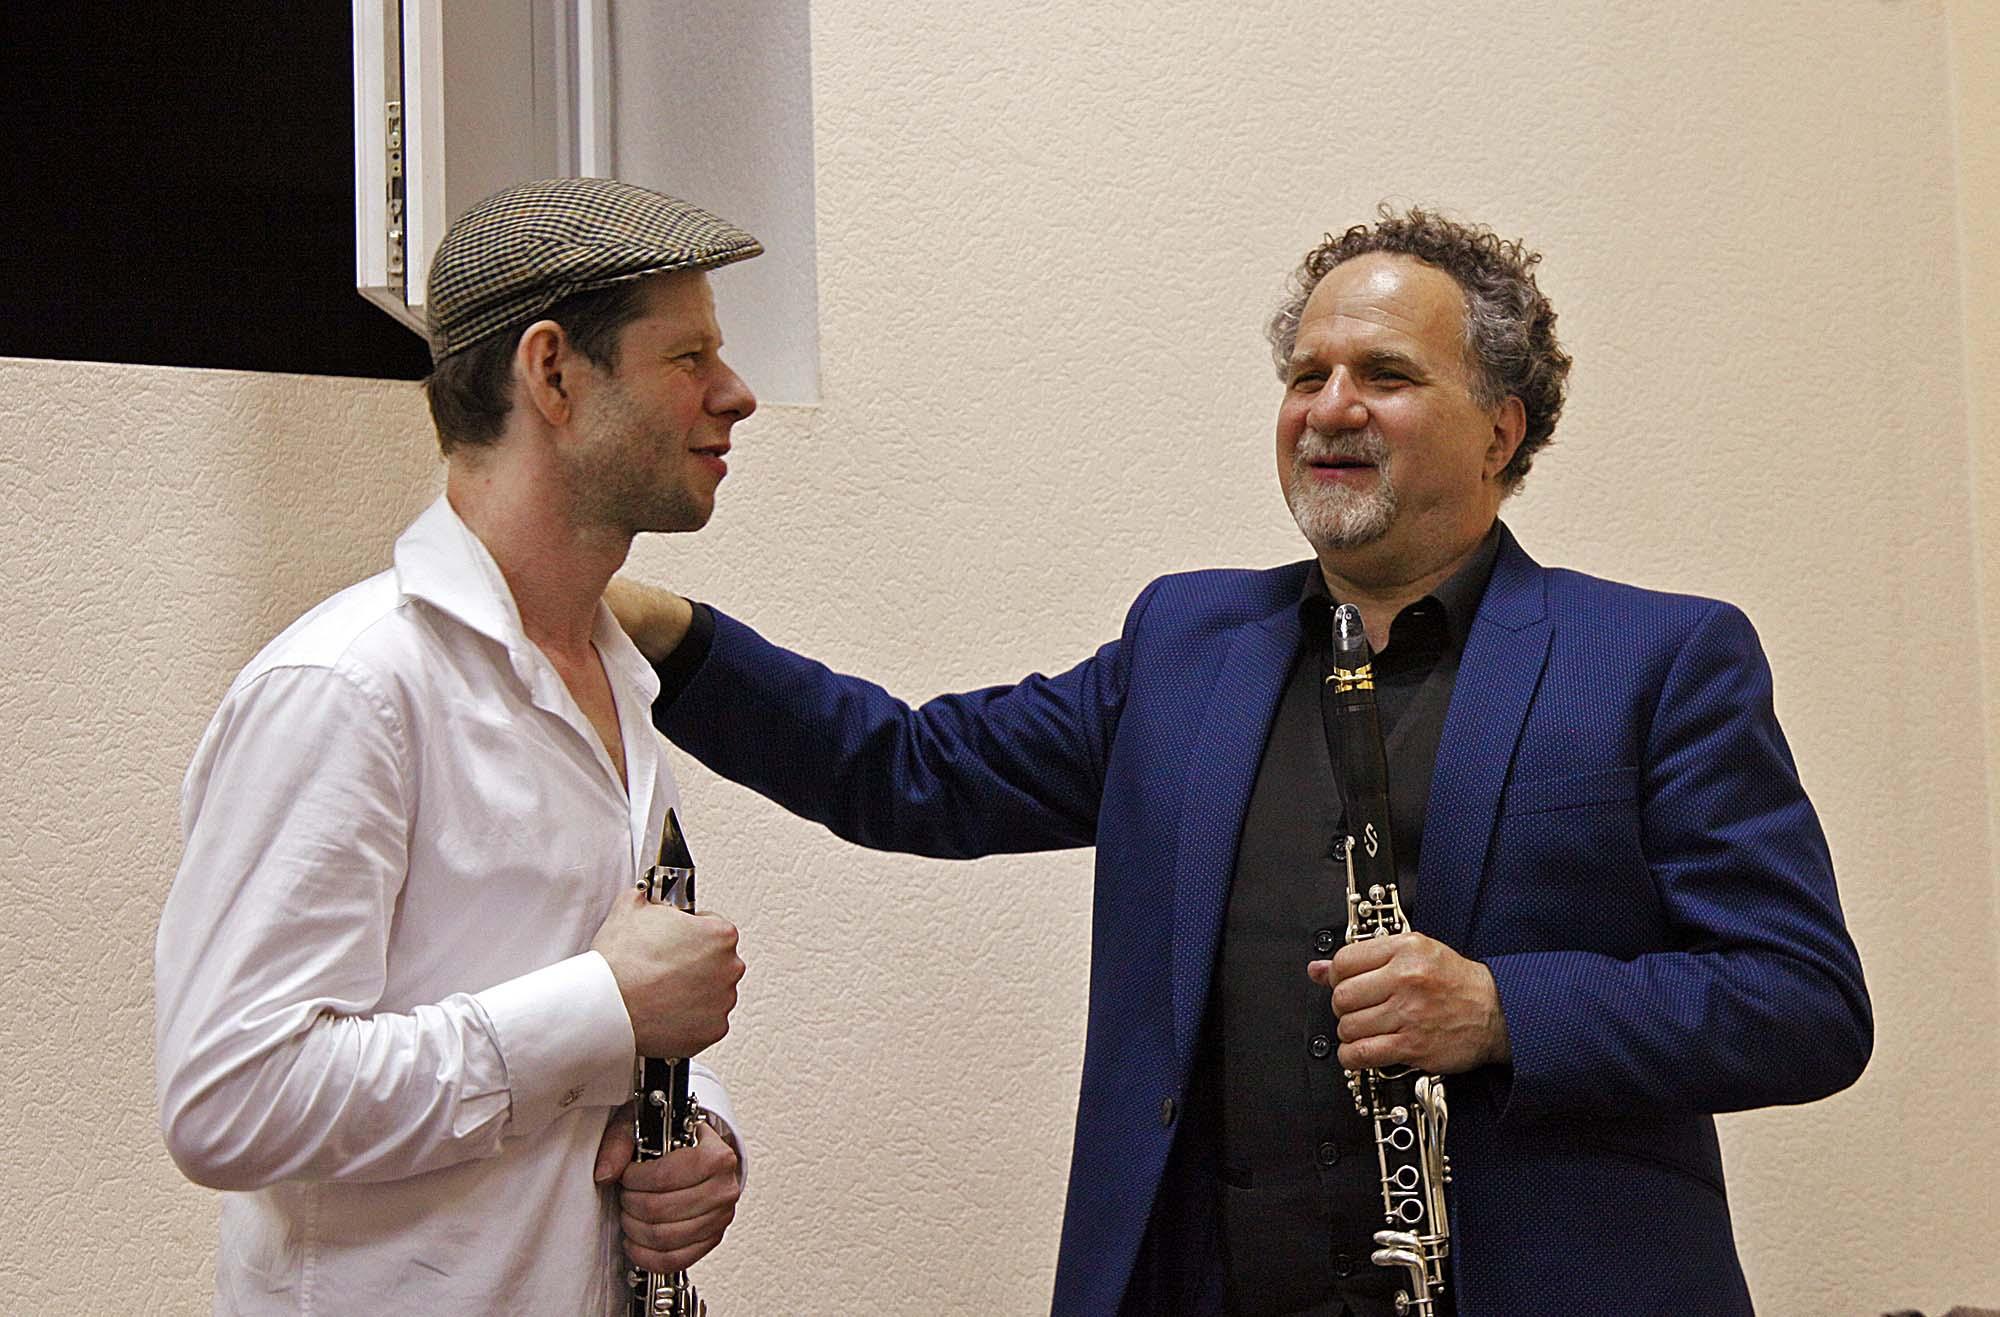 Митя Герасимов, засновник Kyiv Klezmer Fest, керівник гурту Pushkin! Klezmer Band, та David Krakauer